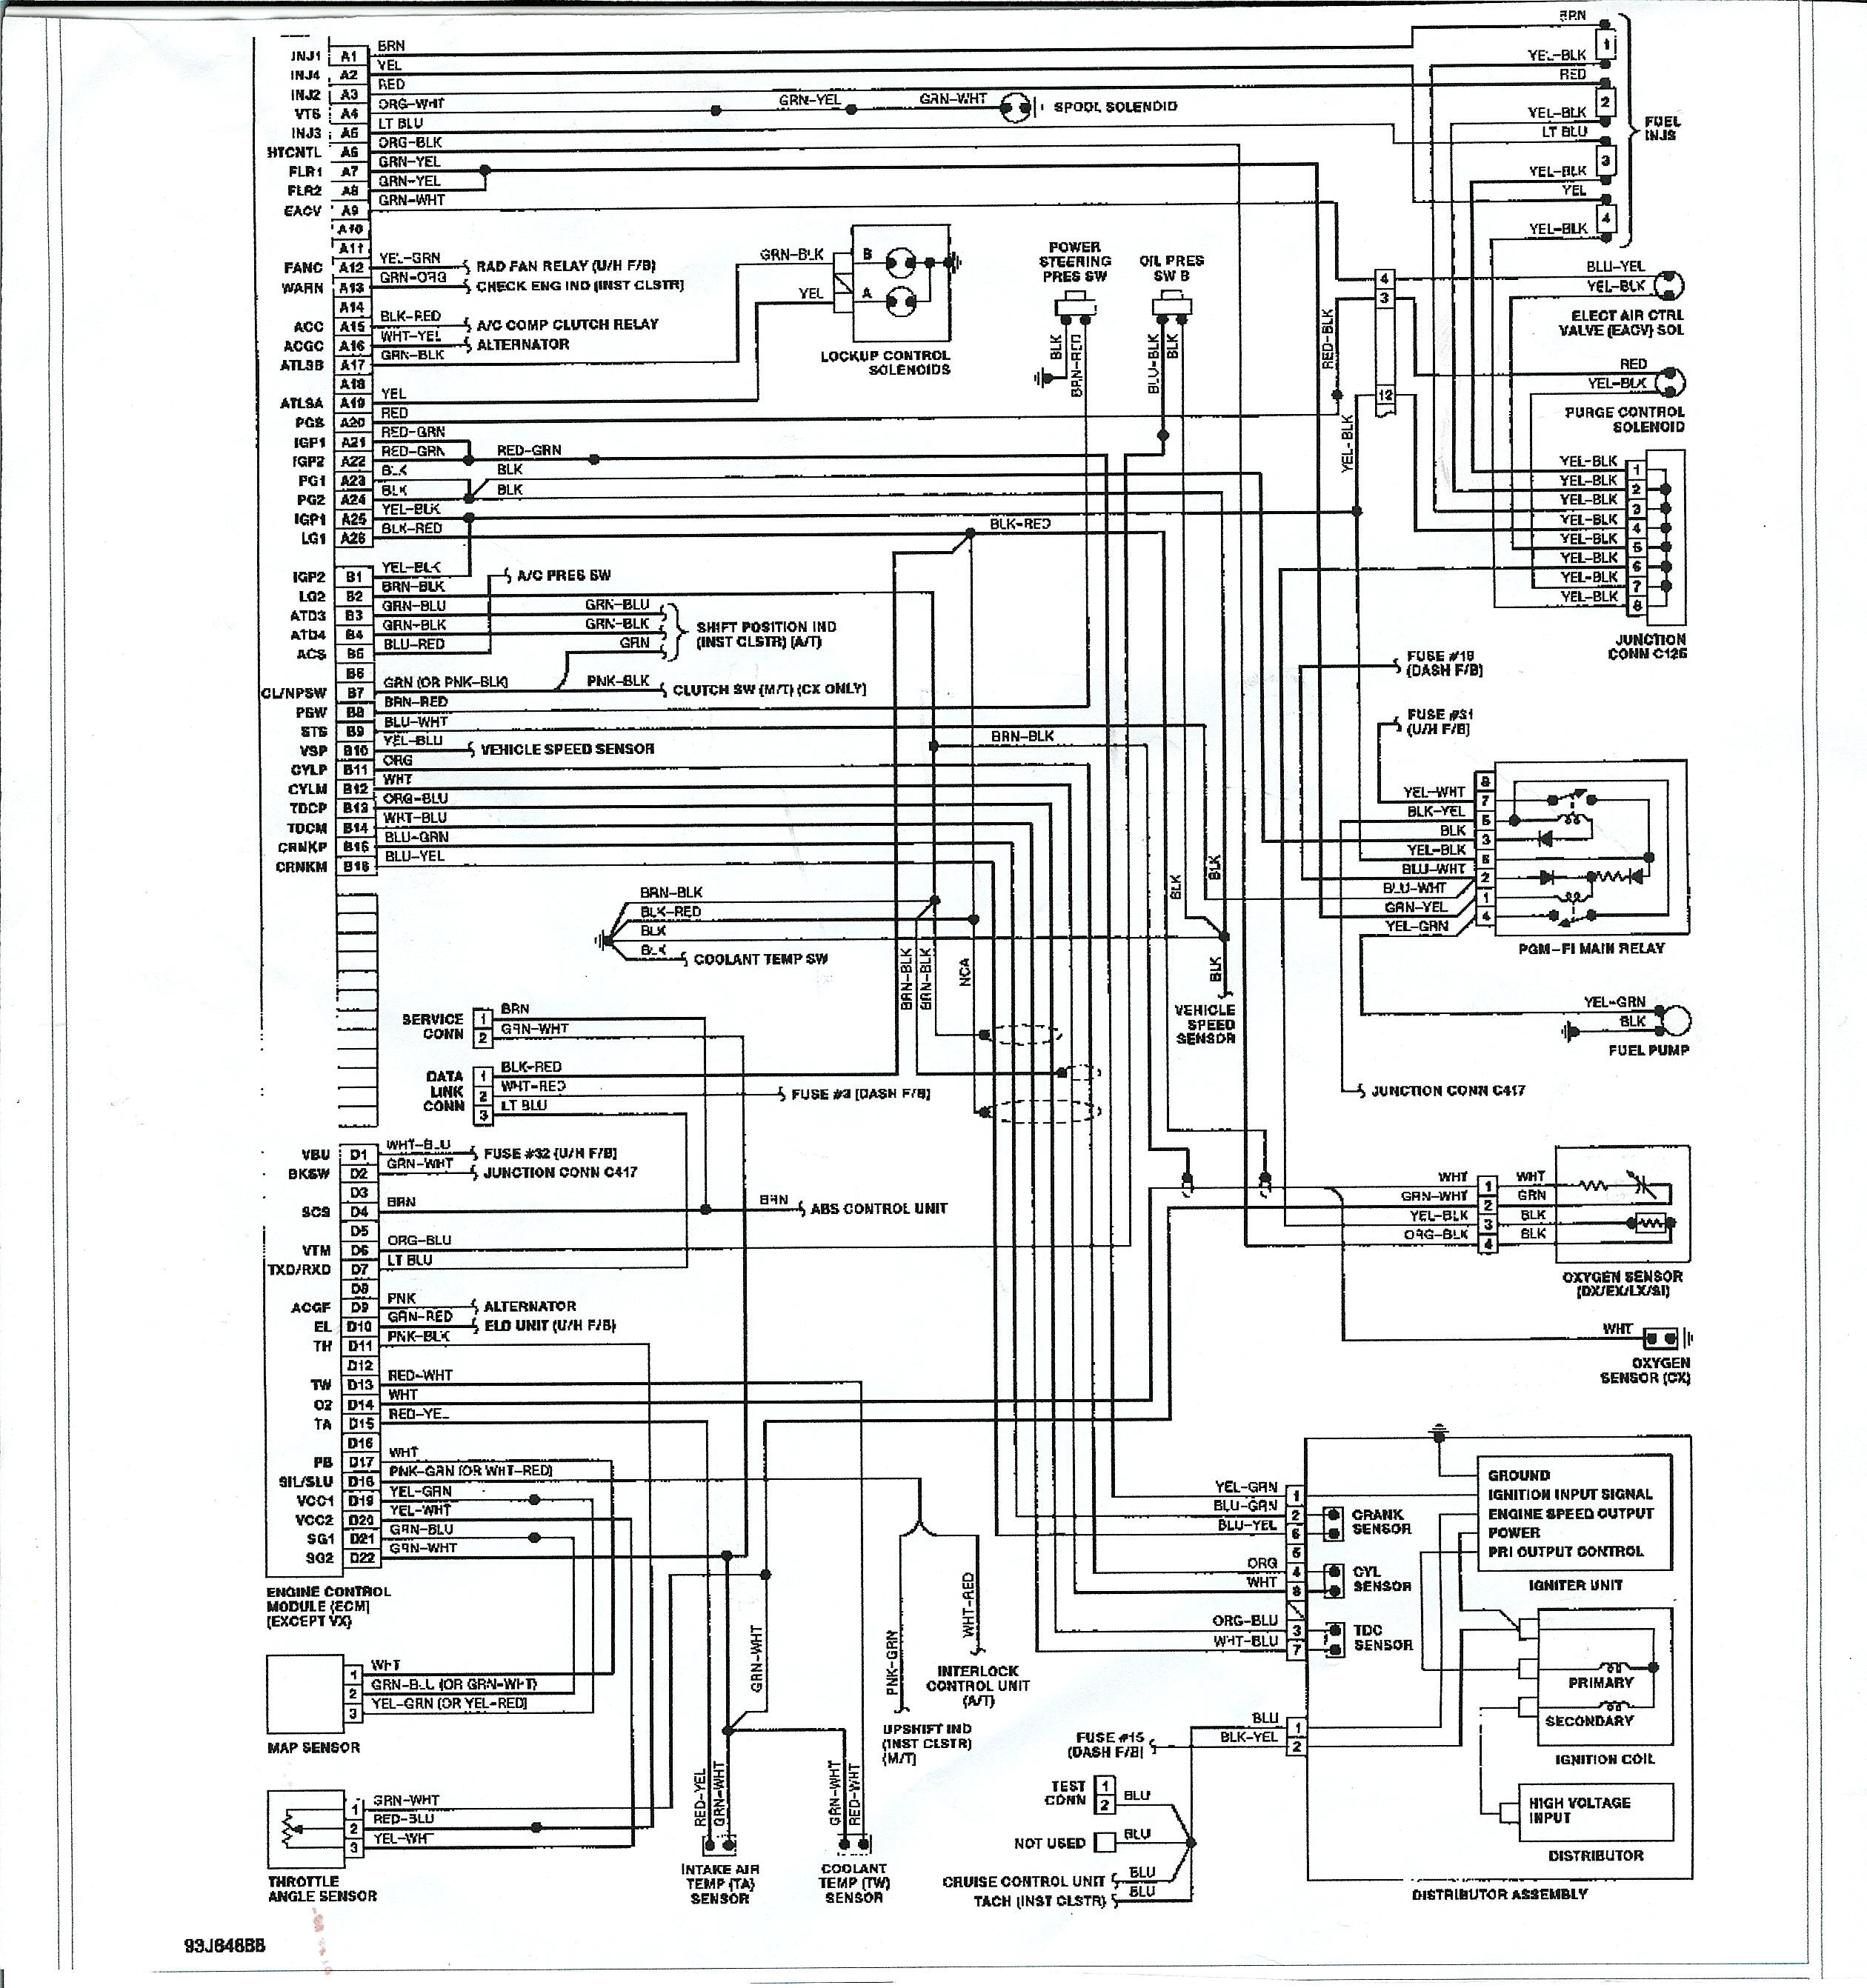 Honda Civic Engine Diagram Vw Transporter Wiring Diagram 95 Honda Civic Transmission Diagram Of Honda Civic Engine Diagram